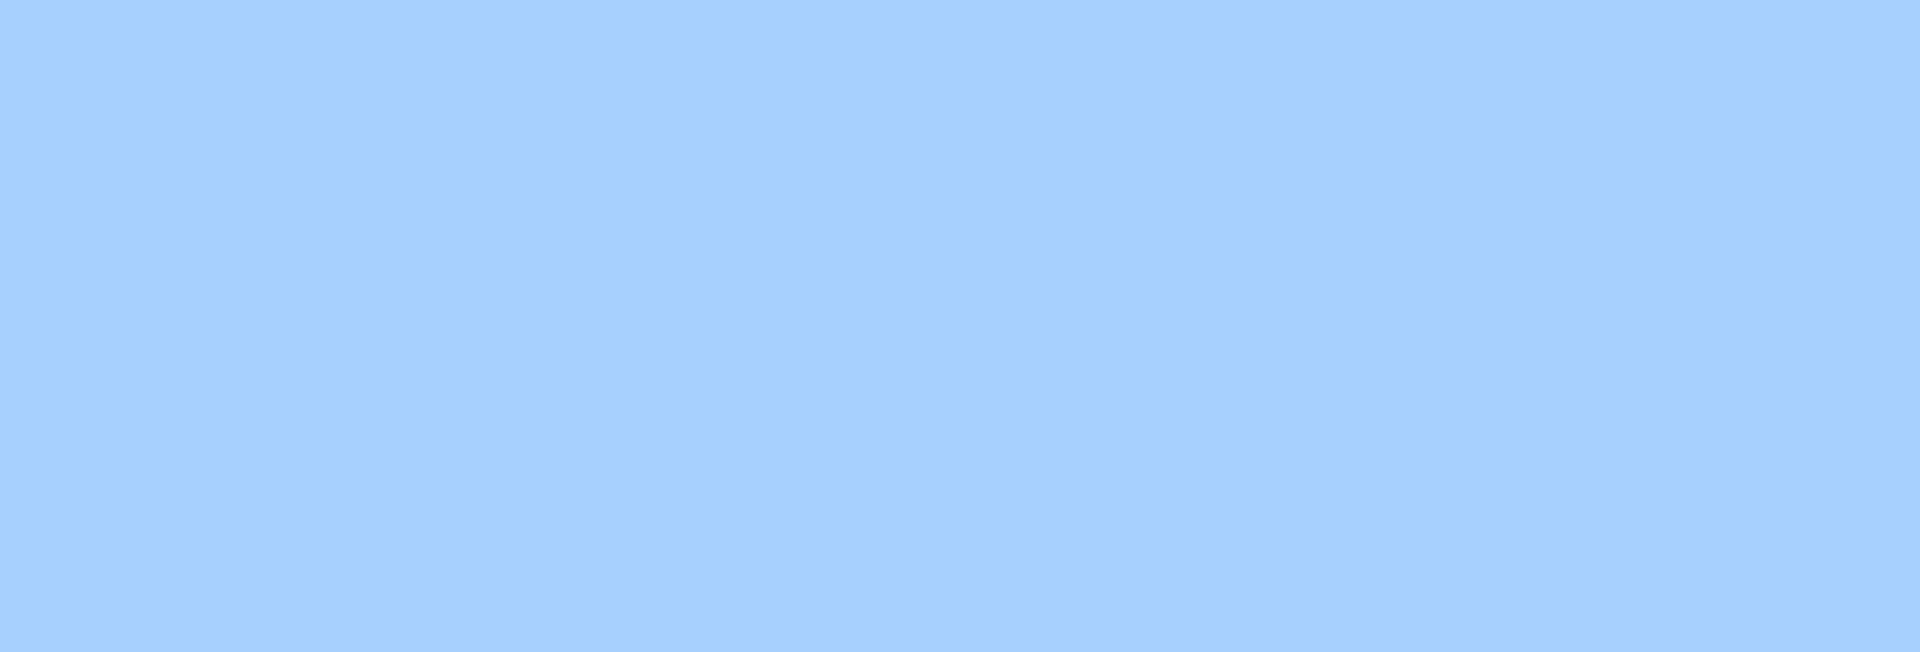 https://www.silberwerk.de/media/image/6d/1d/53/KategorieBanner_Kategorie_farbe_blau.jpg